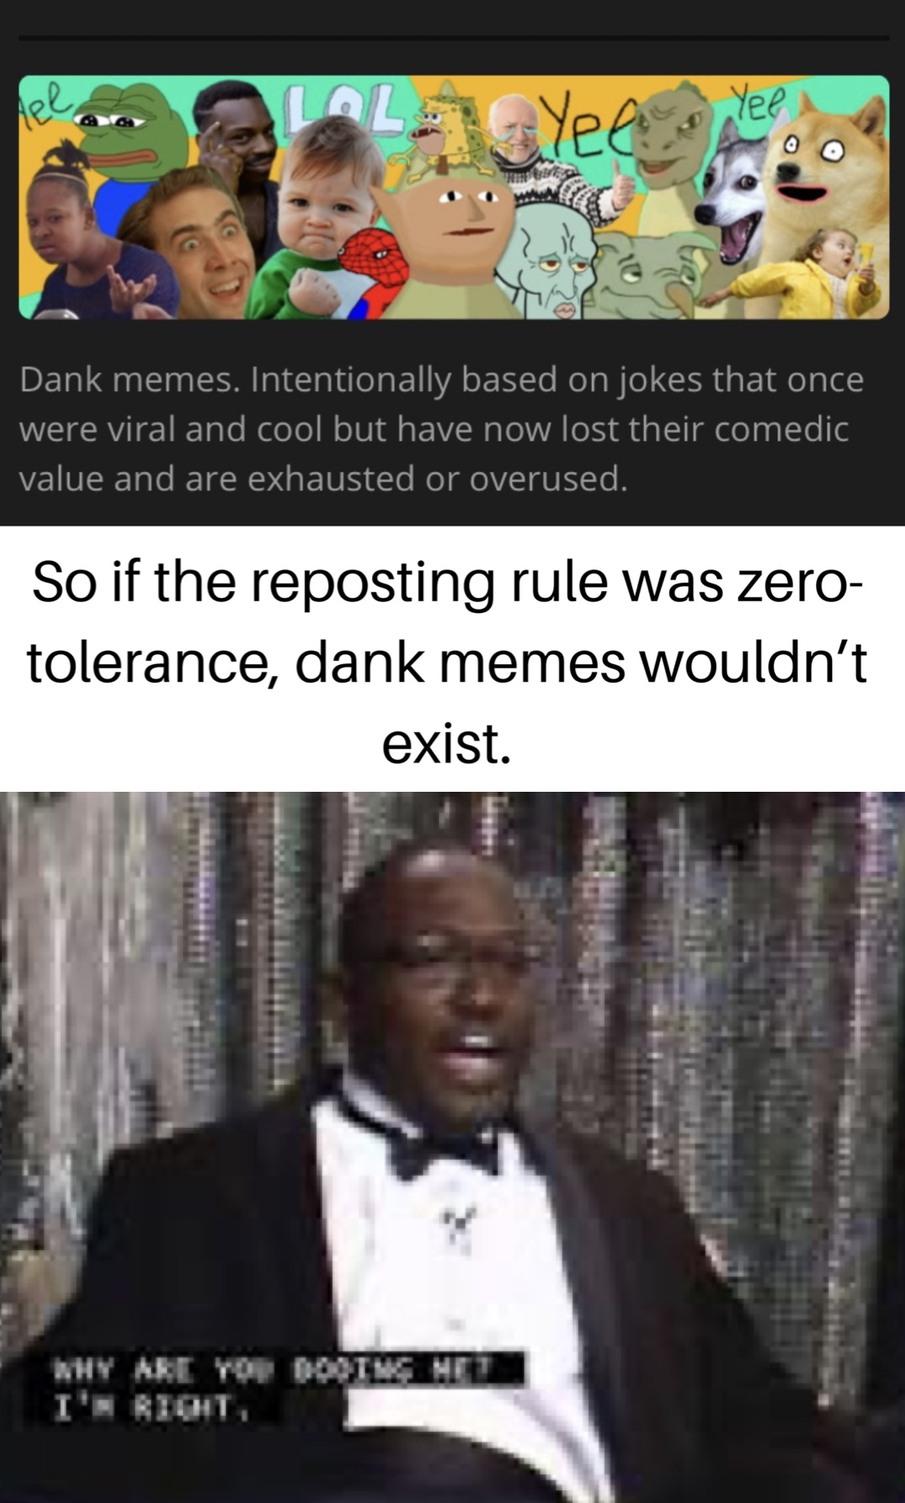 Dank Memes, *poof*